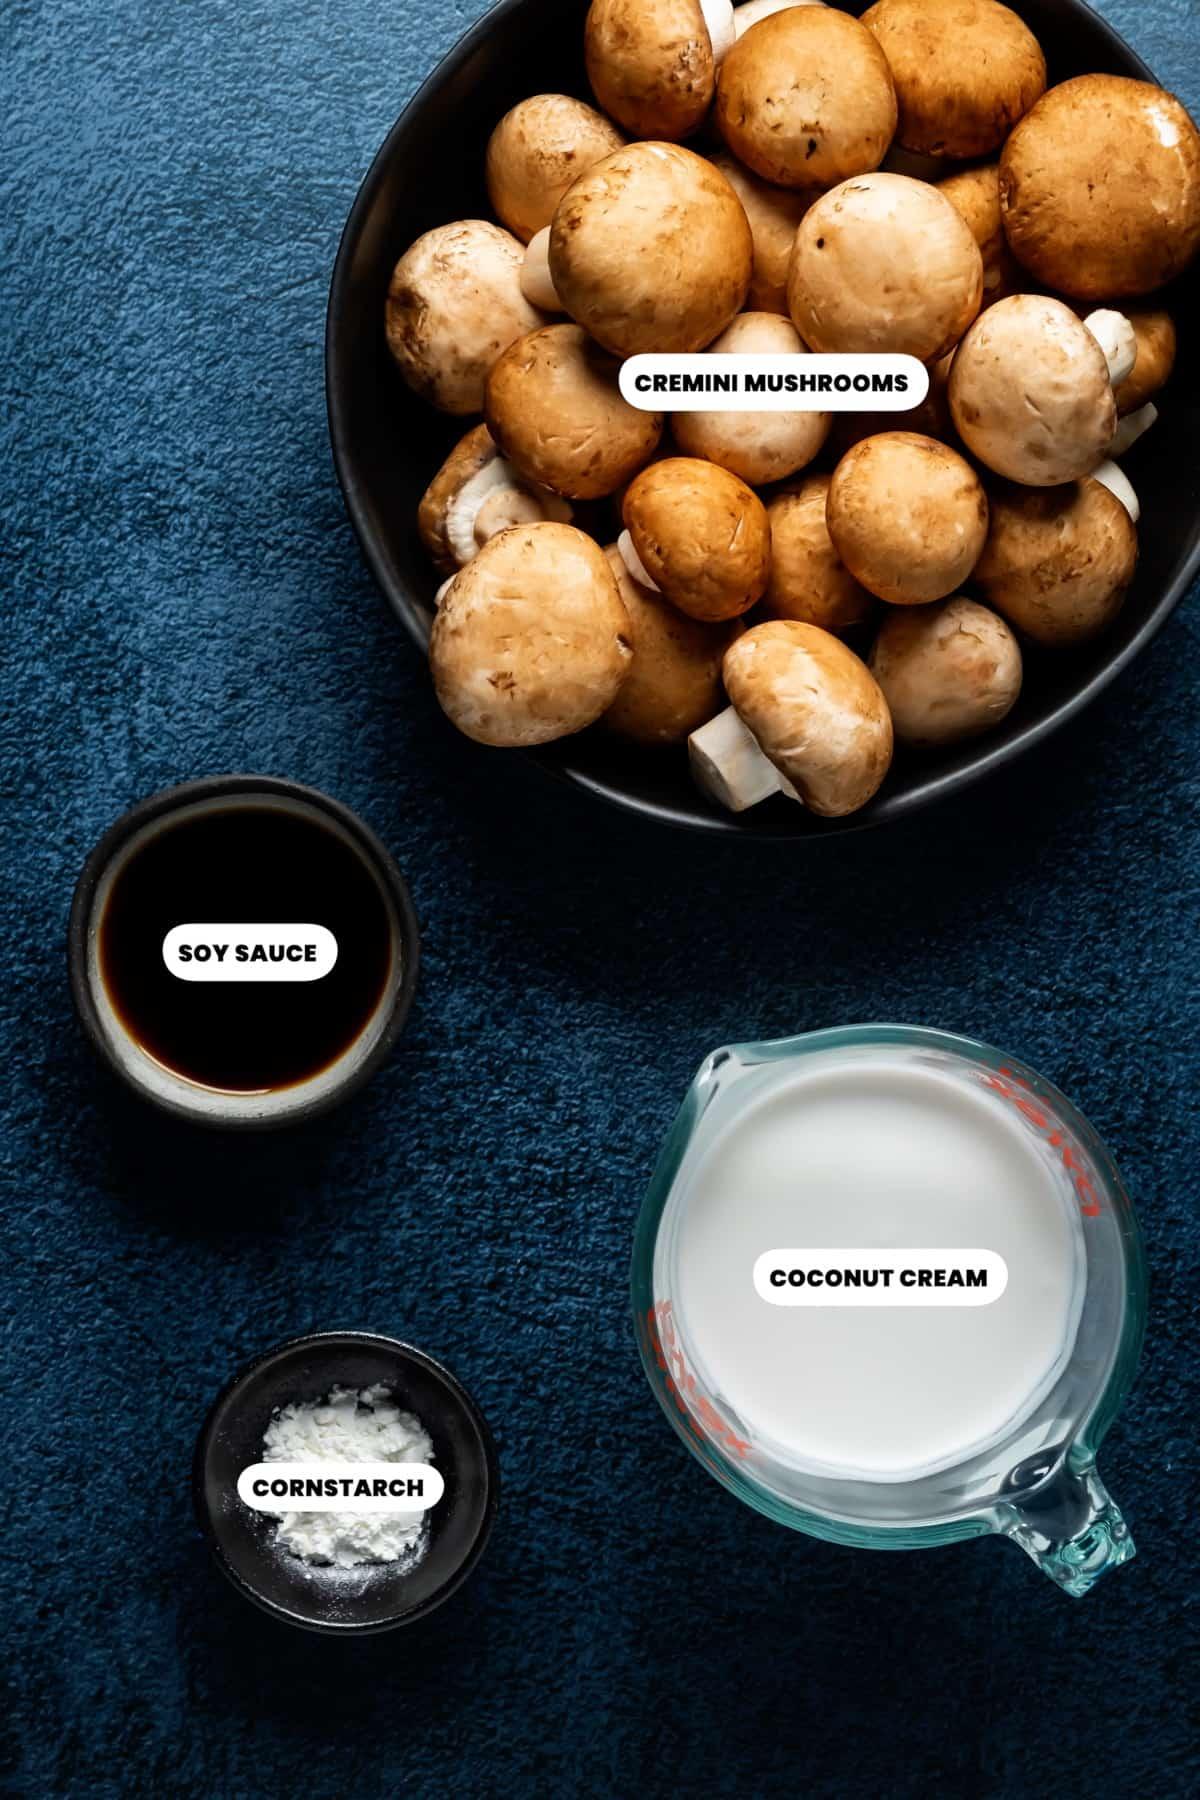 Ingredients to make mushroom sauce for tofu burgers.